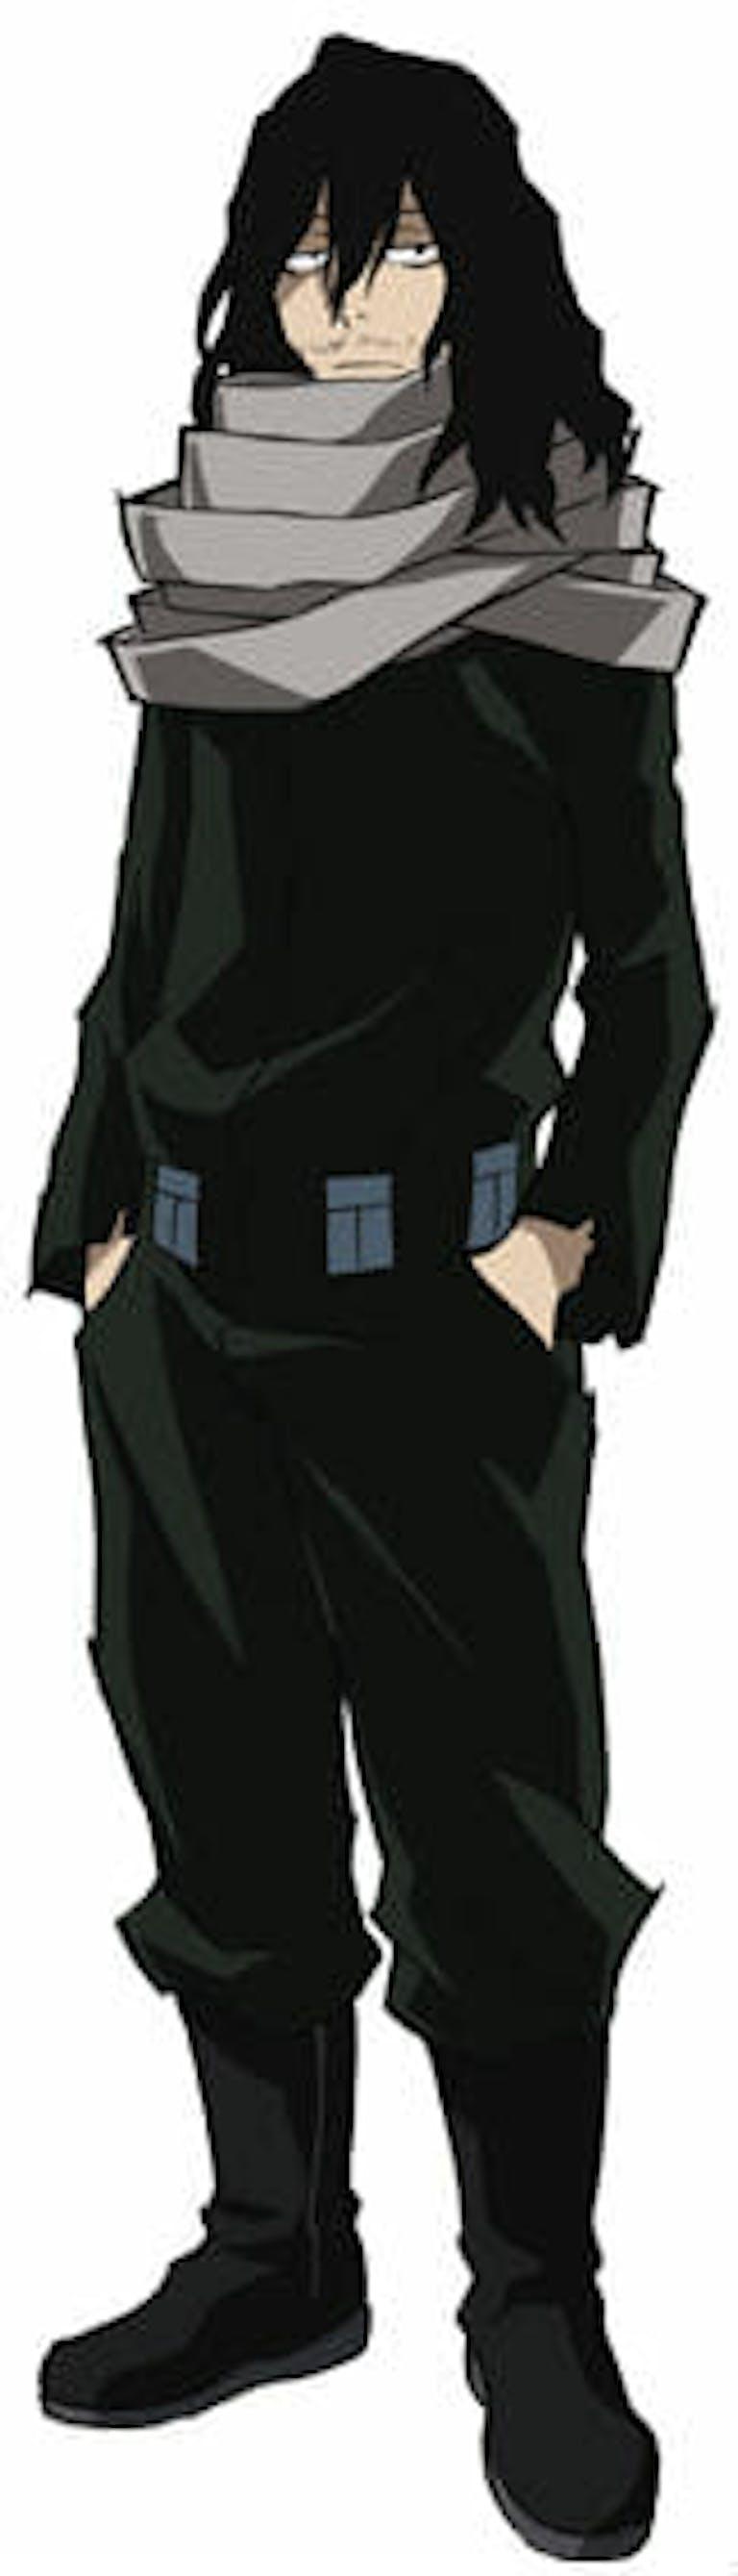 my hero academia characters : eraserhead